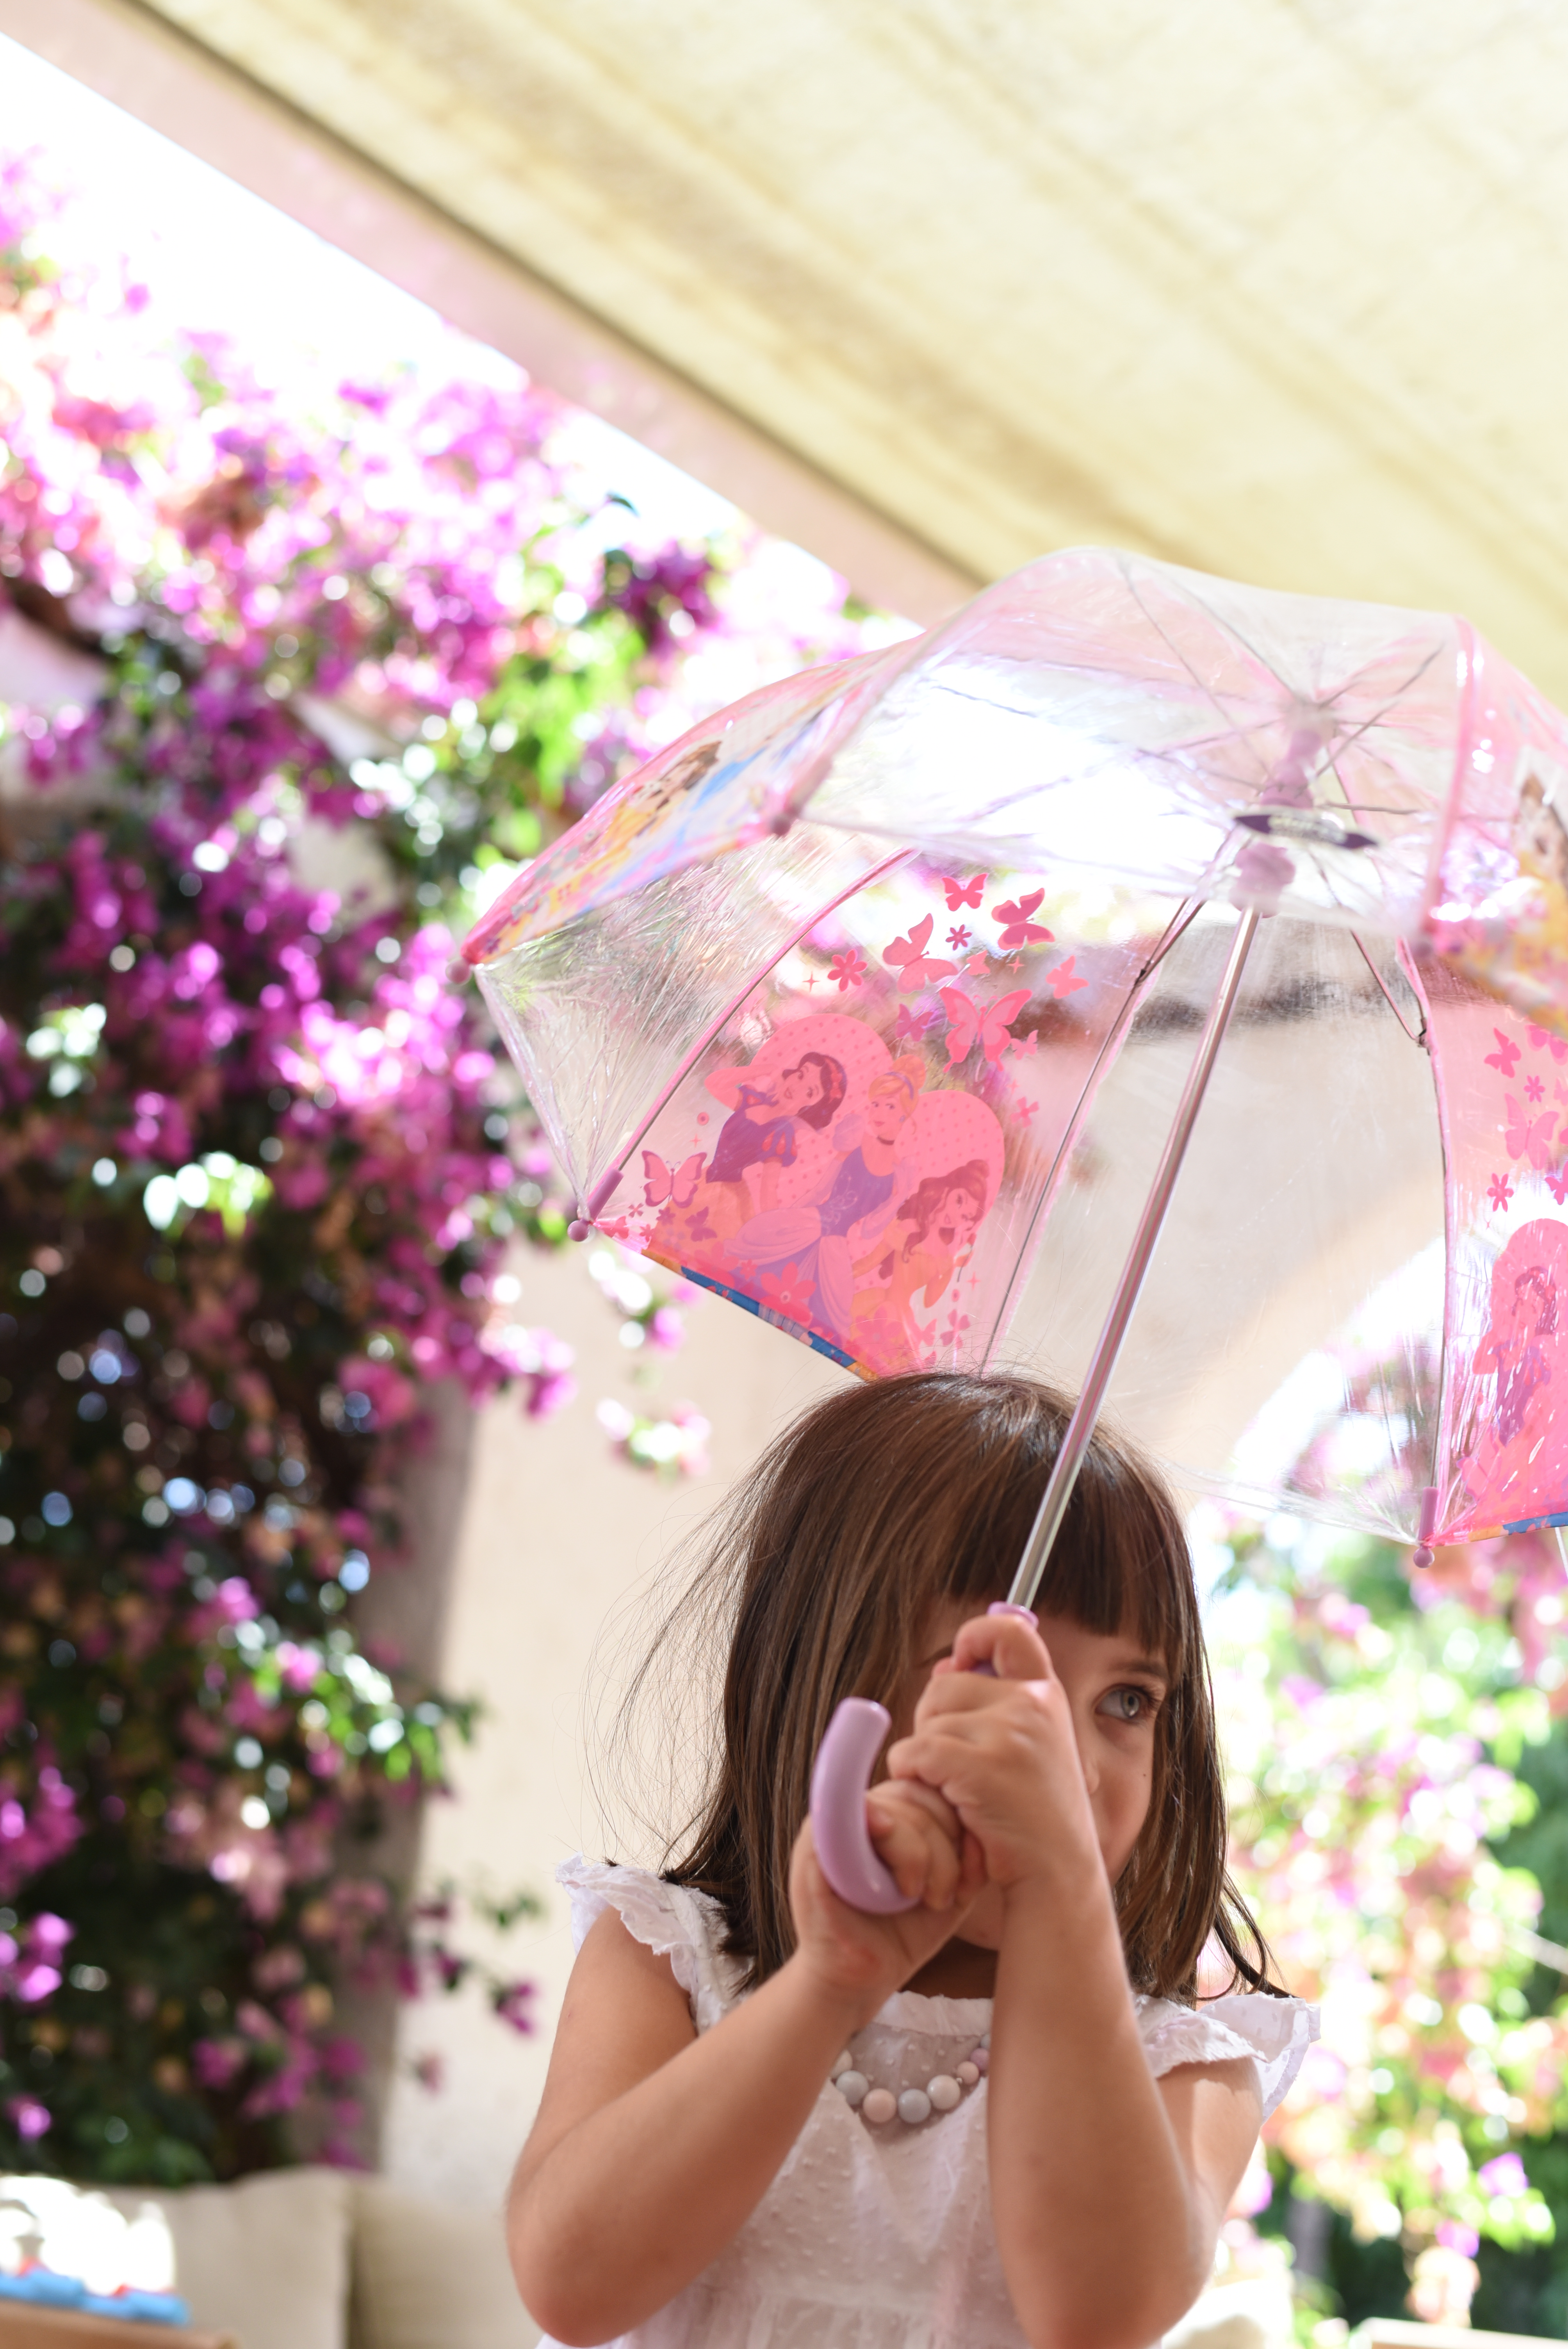 baton de pluie